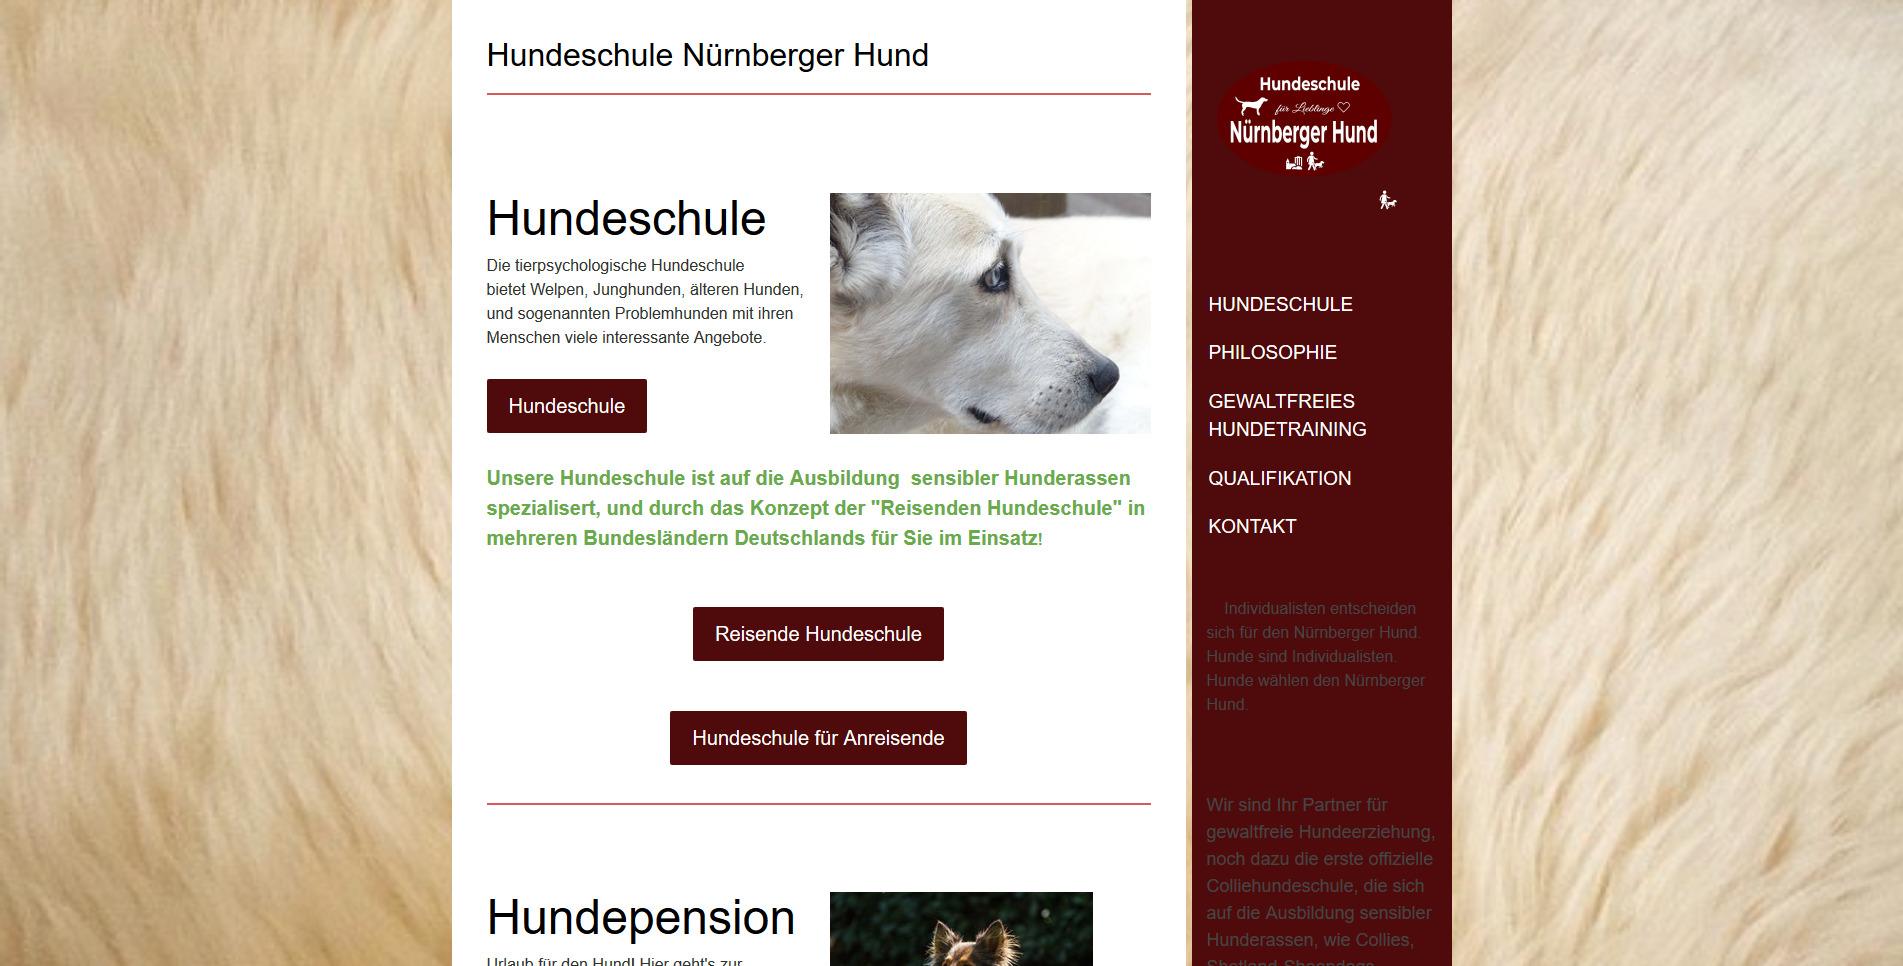 Hundeschule Nürnberger Hund